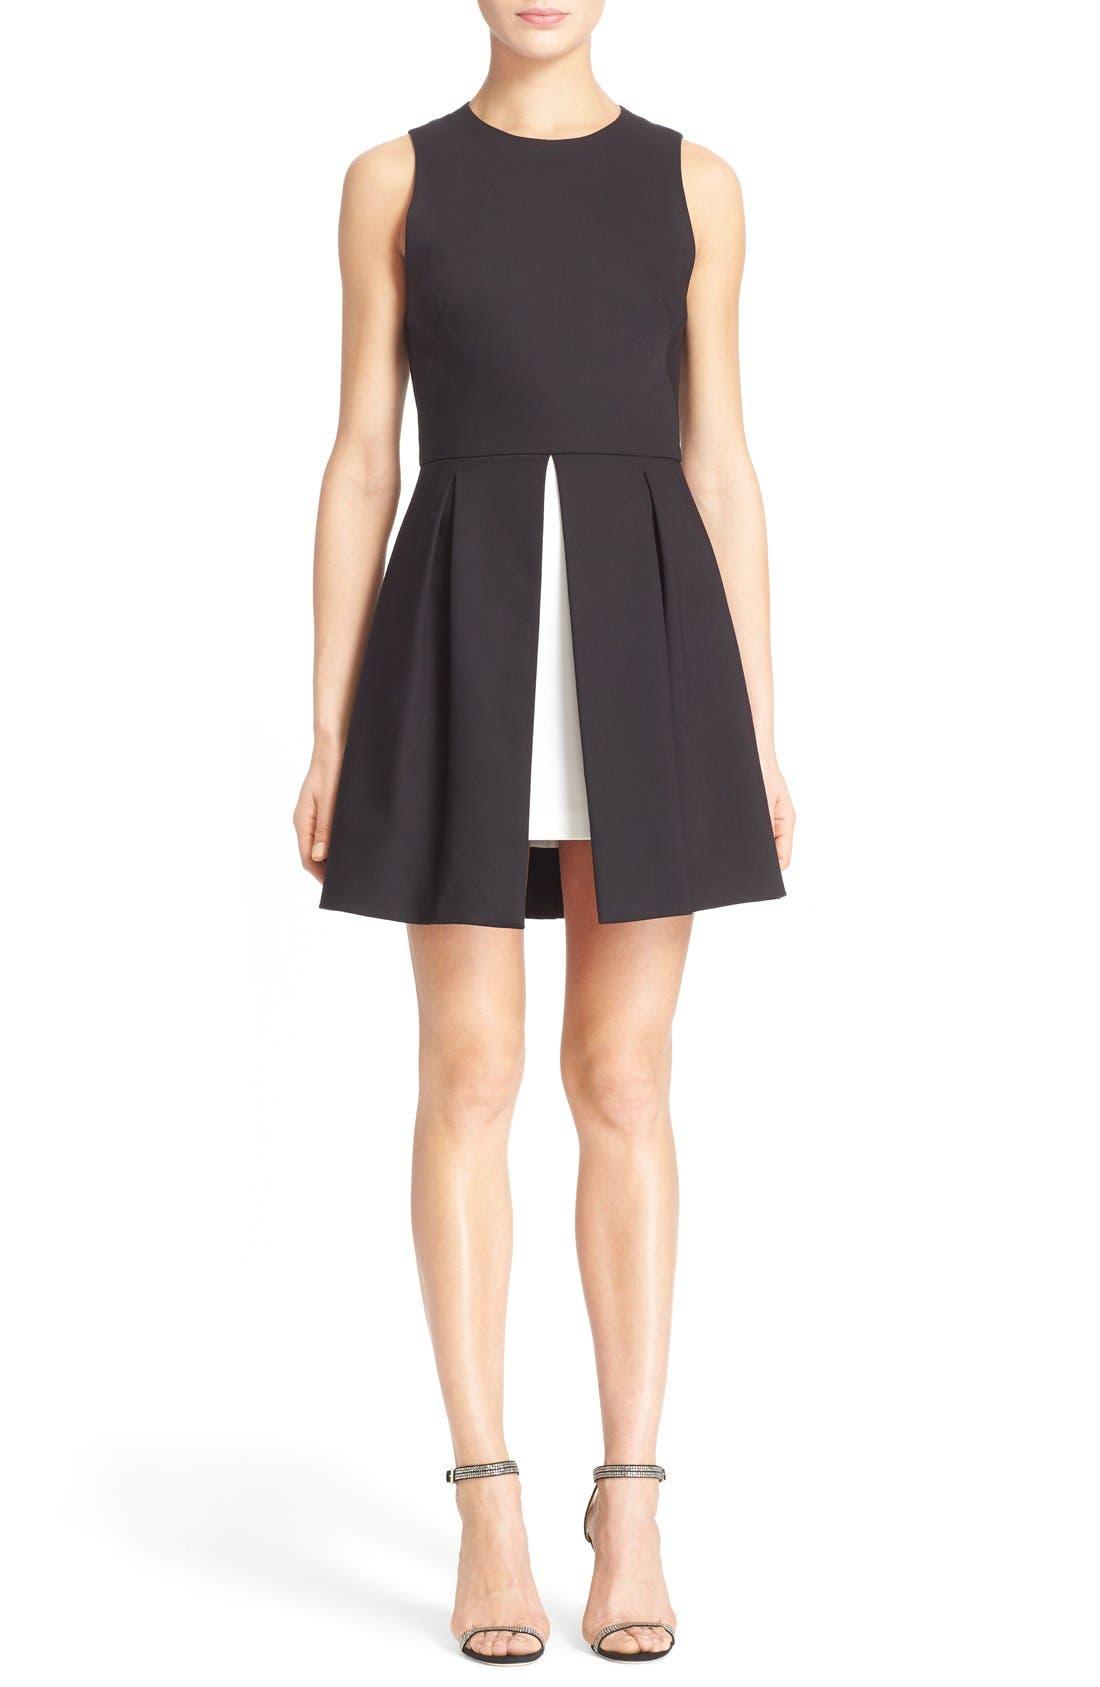 Alternate Image 1 Selected - Alice + Olivia 'Bria' Peplum Fit & Flare Dress